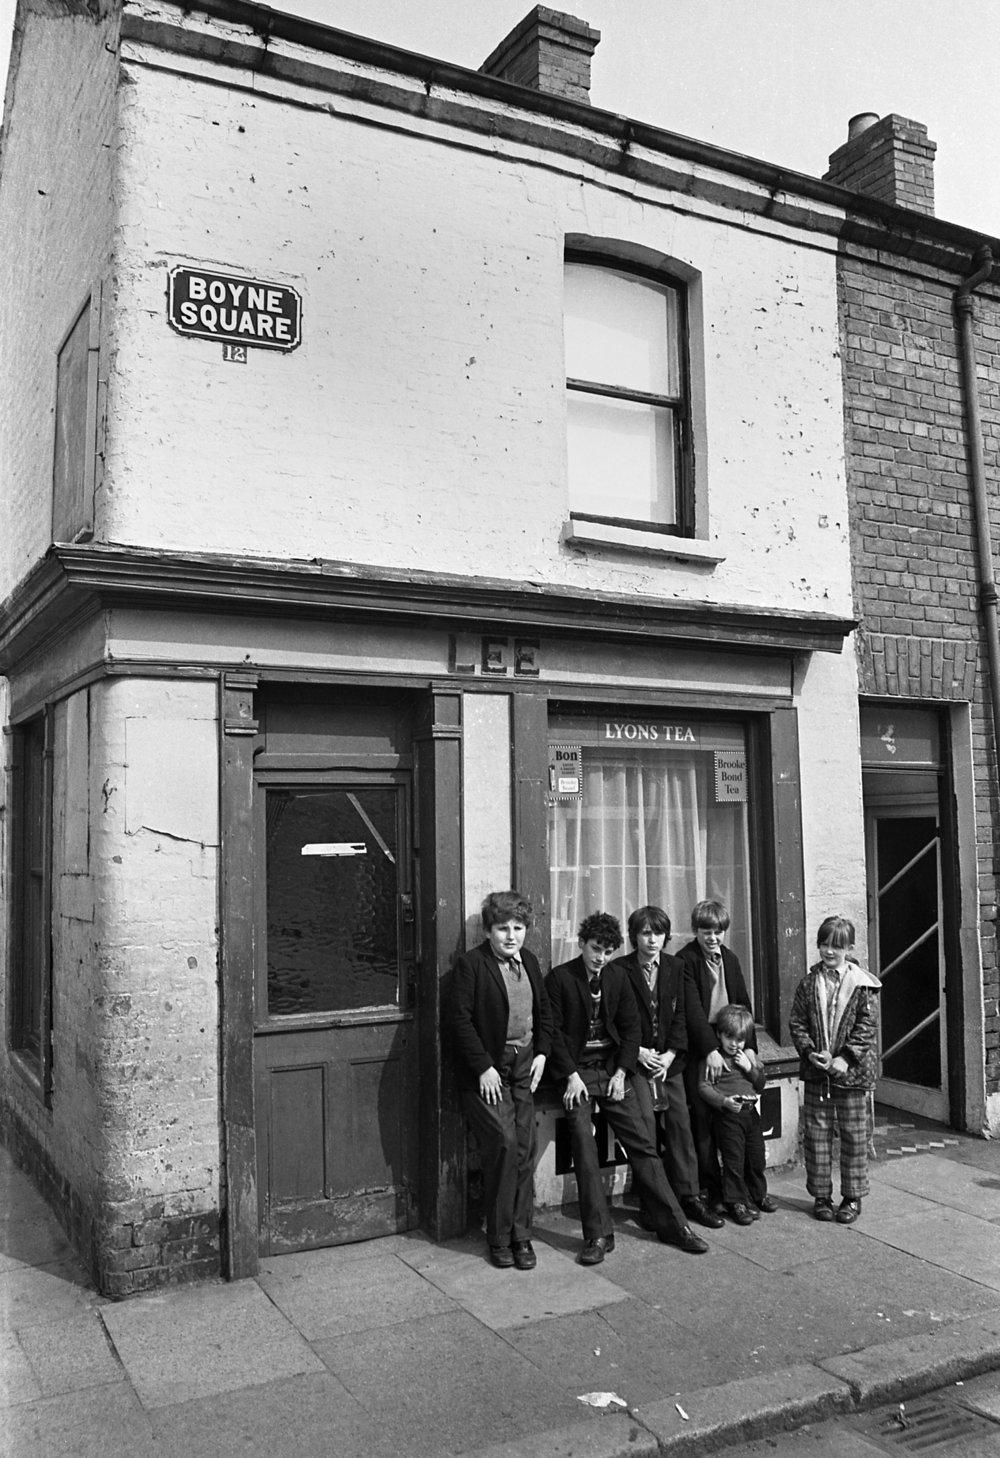 Shops-Boyne Square 1974.jpg